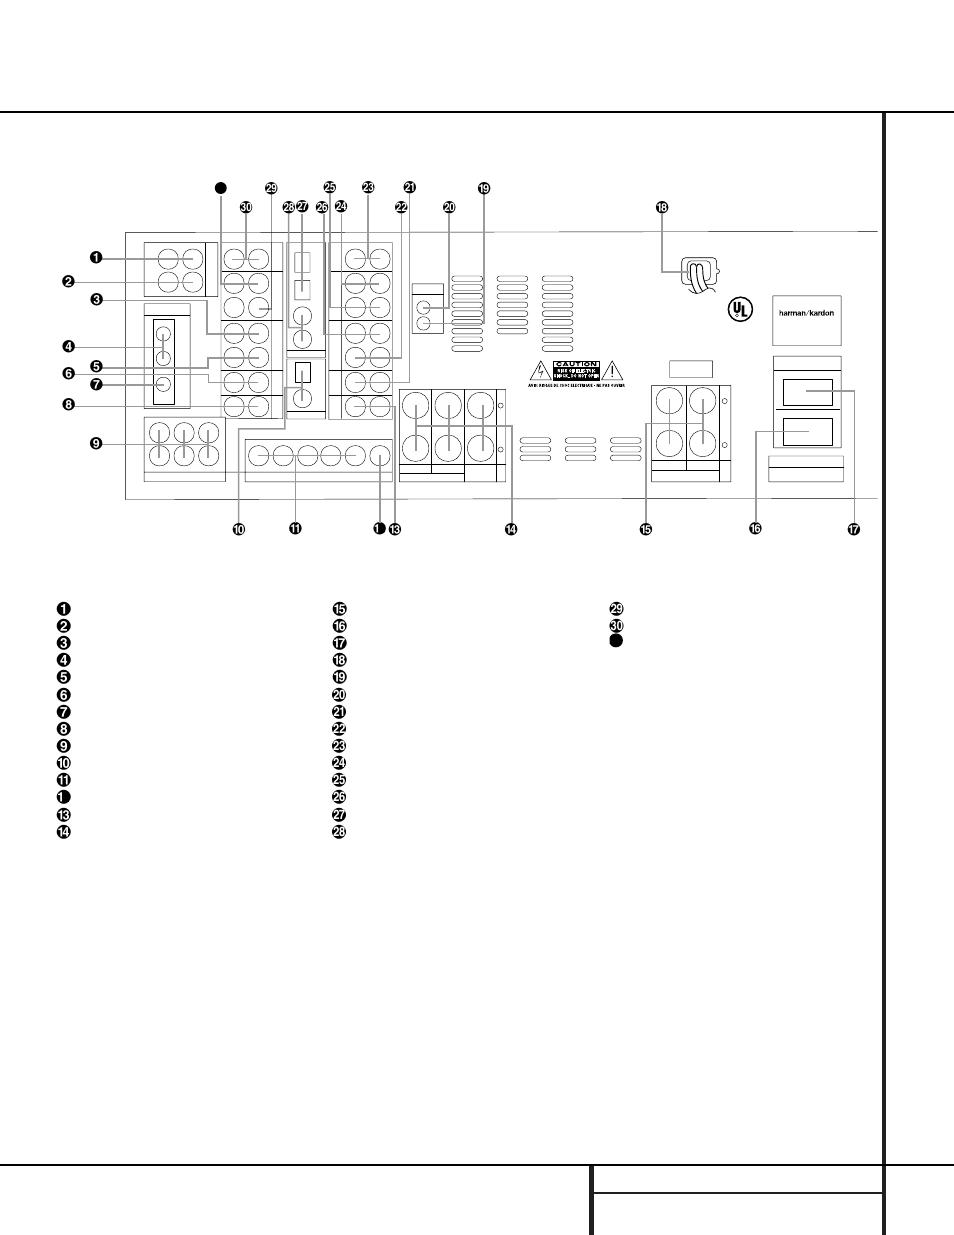 Rear panel connections, 9 rear panel connections, Fg j